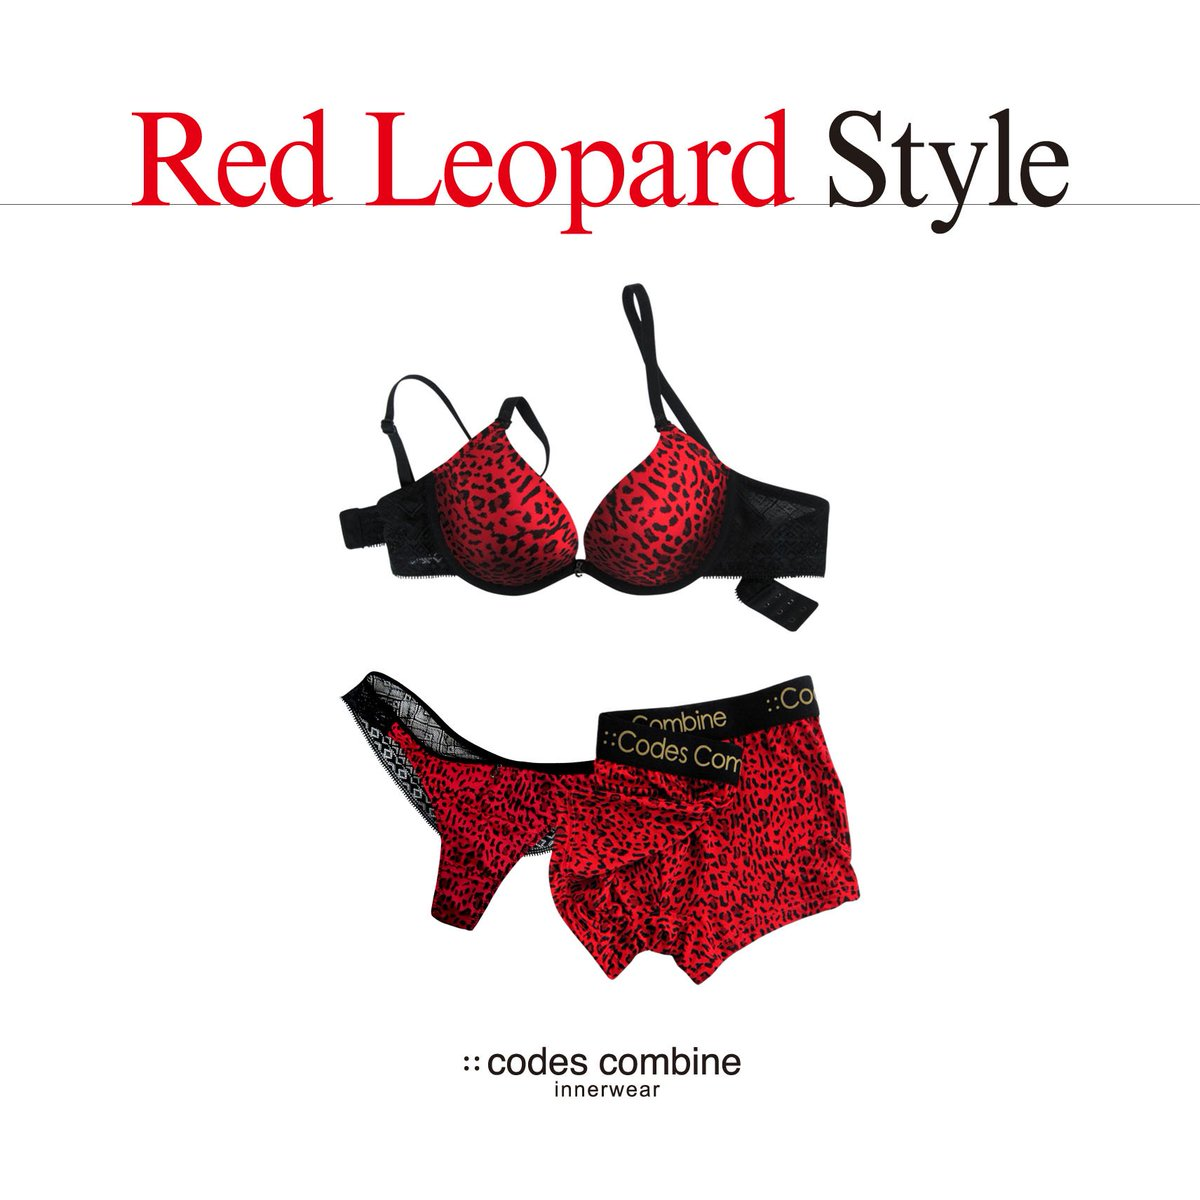 "[::codescombine innerwear] 코데즈컴바인 이너웨어의 Christmas와 특히 어울리는   ""Red Leopard Style Set""~!! 매혹적인 레드 호피 프린트와 레이스 매칭의 섹시함! https://t.co/ameLOBMIGC"